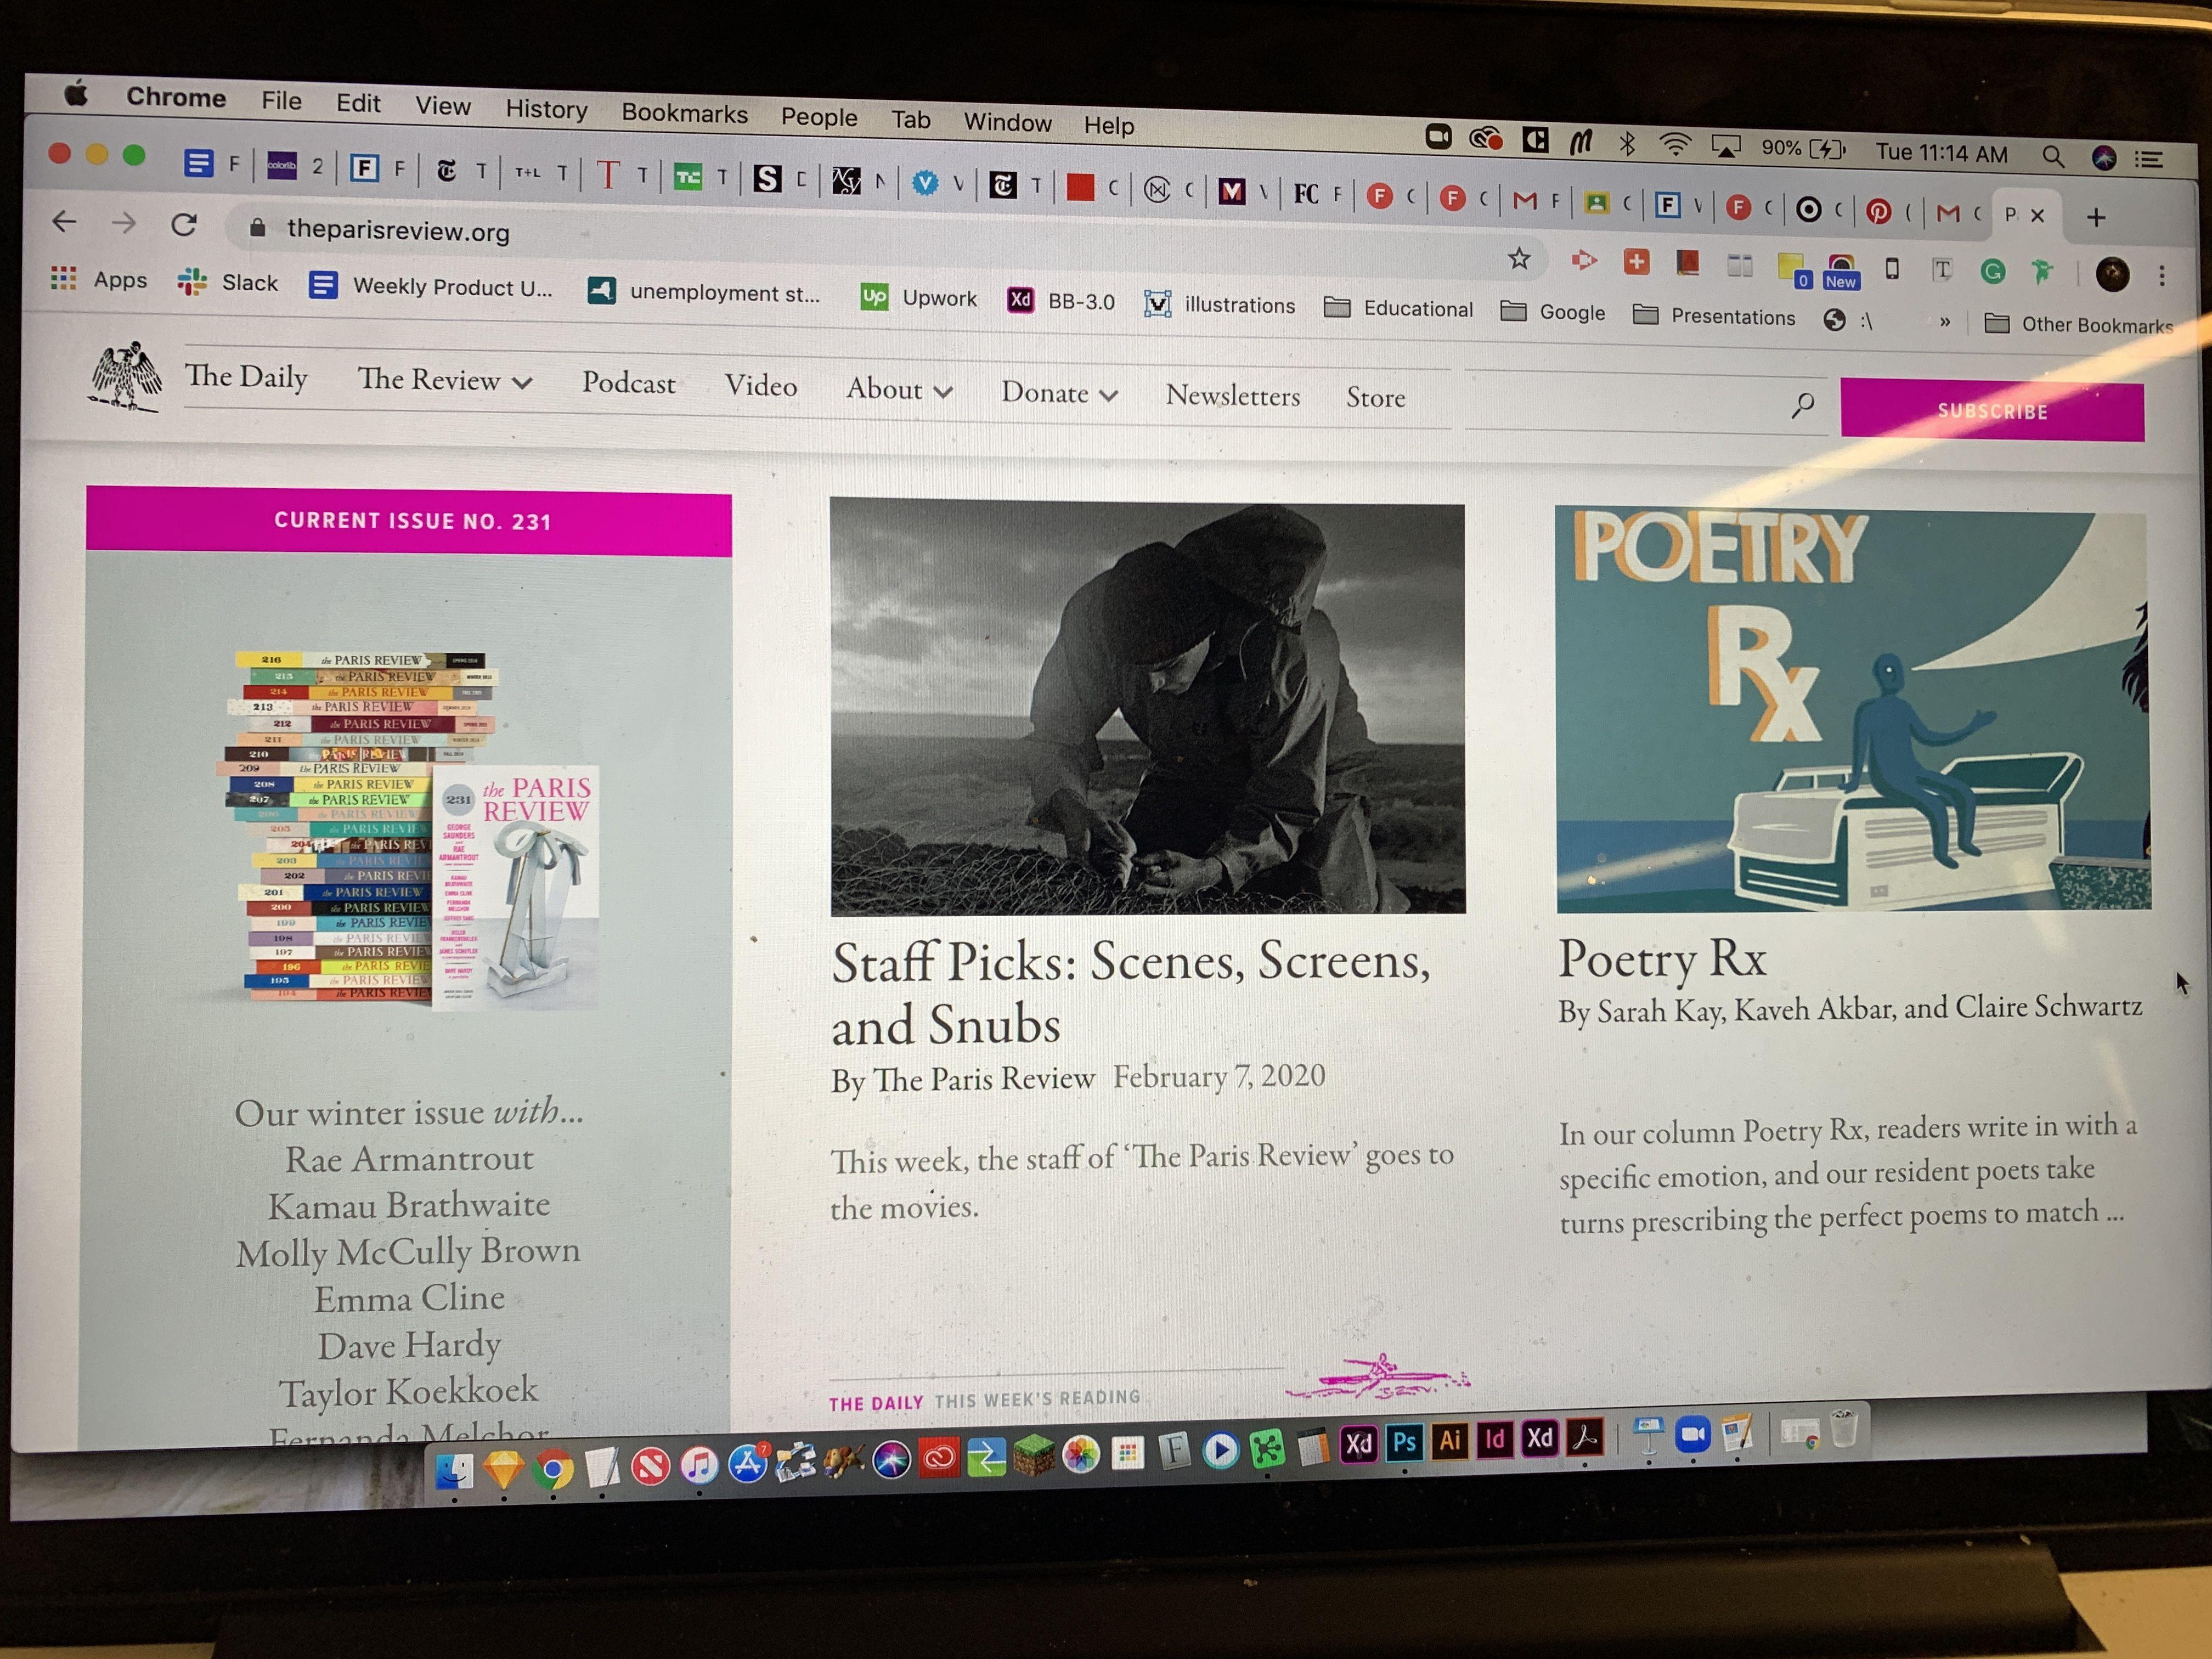 Paris Review 2 in 2020 History bookmarks, Upwork